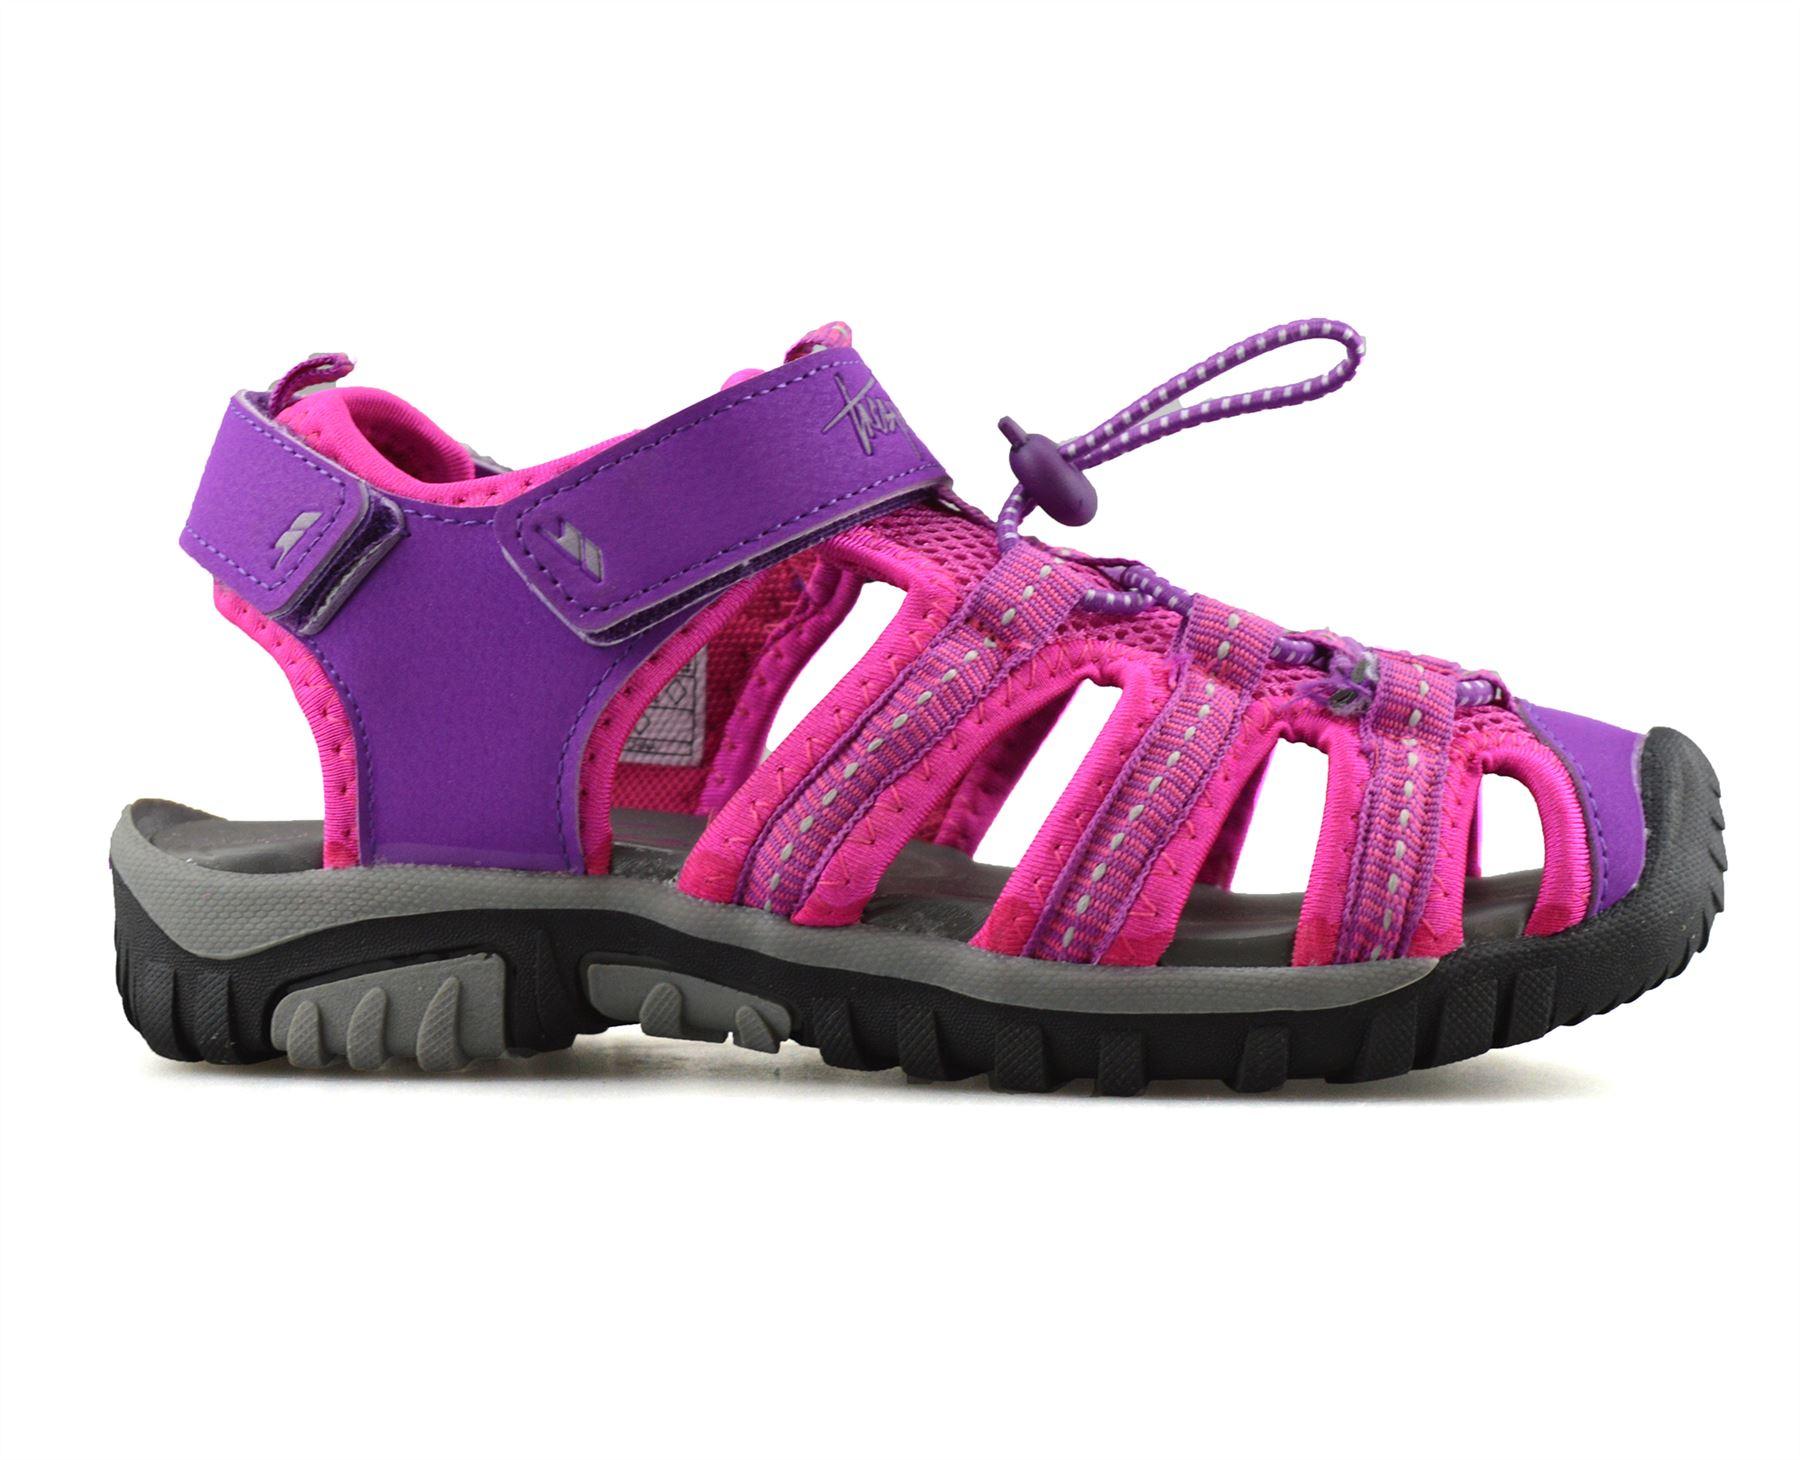 Boys-Girls-Kids-Trespass-Summer-Beach-Casual-Walking-Sports-Sandals-Shoes-Size thumbnail 17